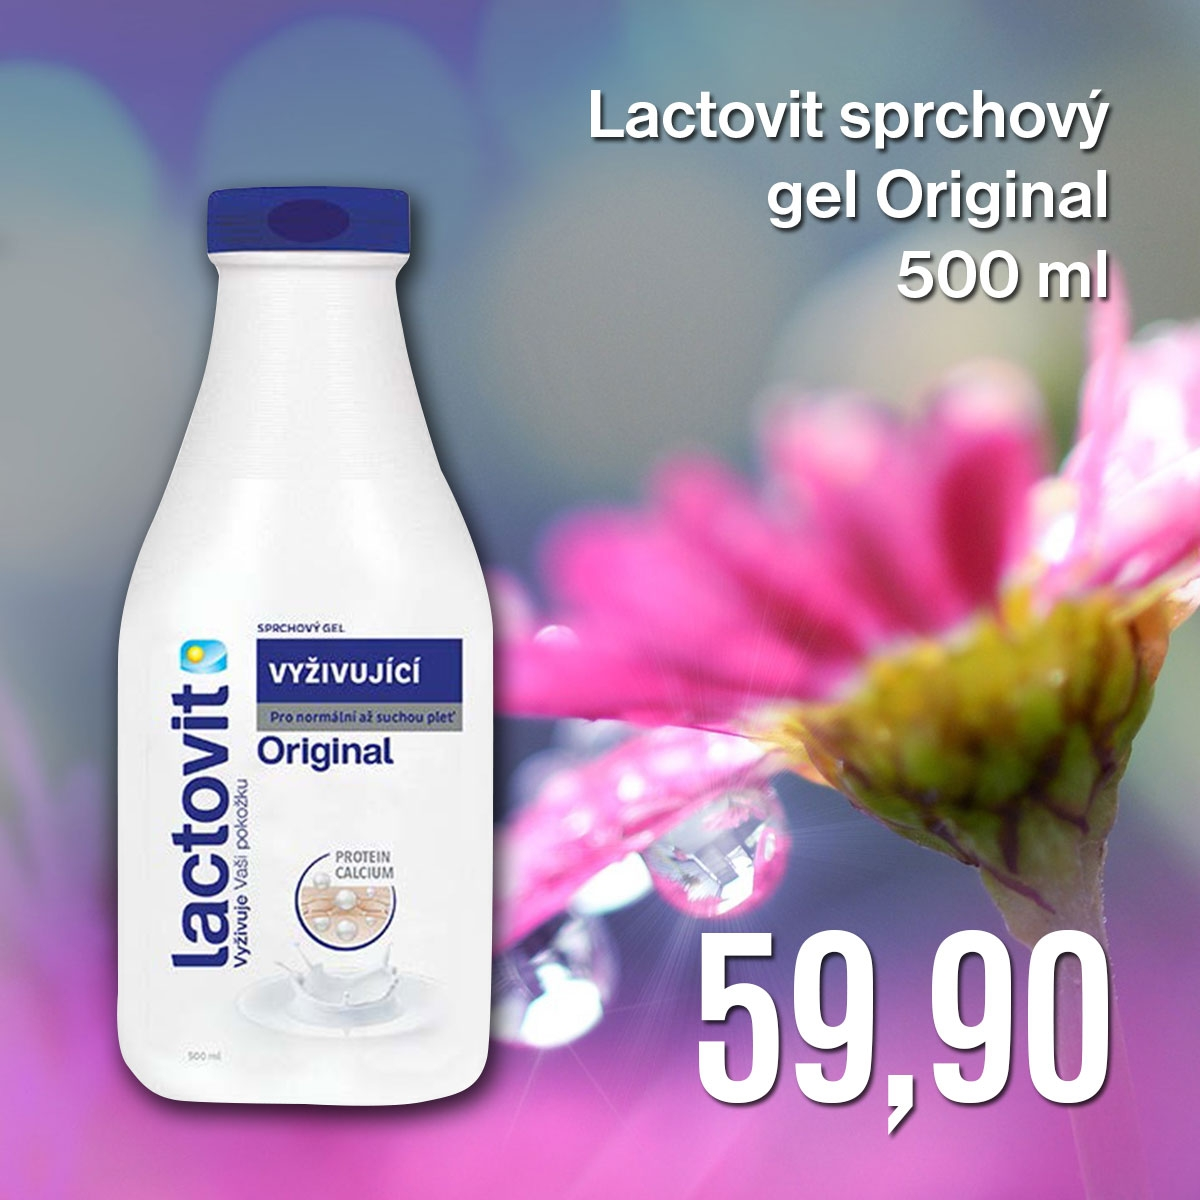 Lactovit sprchový gel Original 500 ml